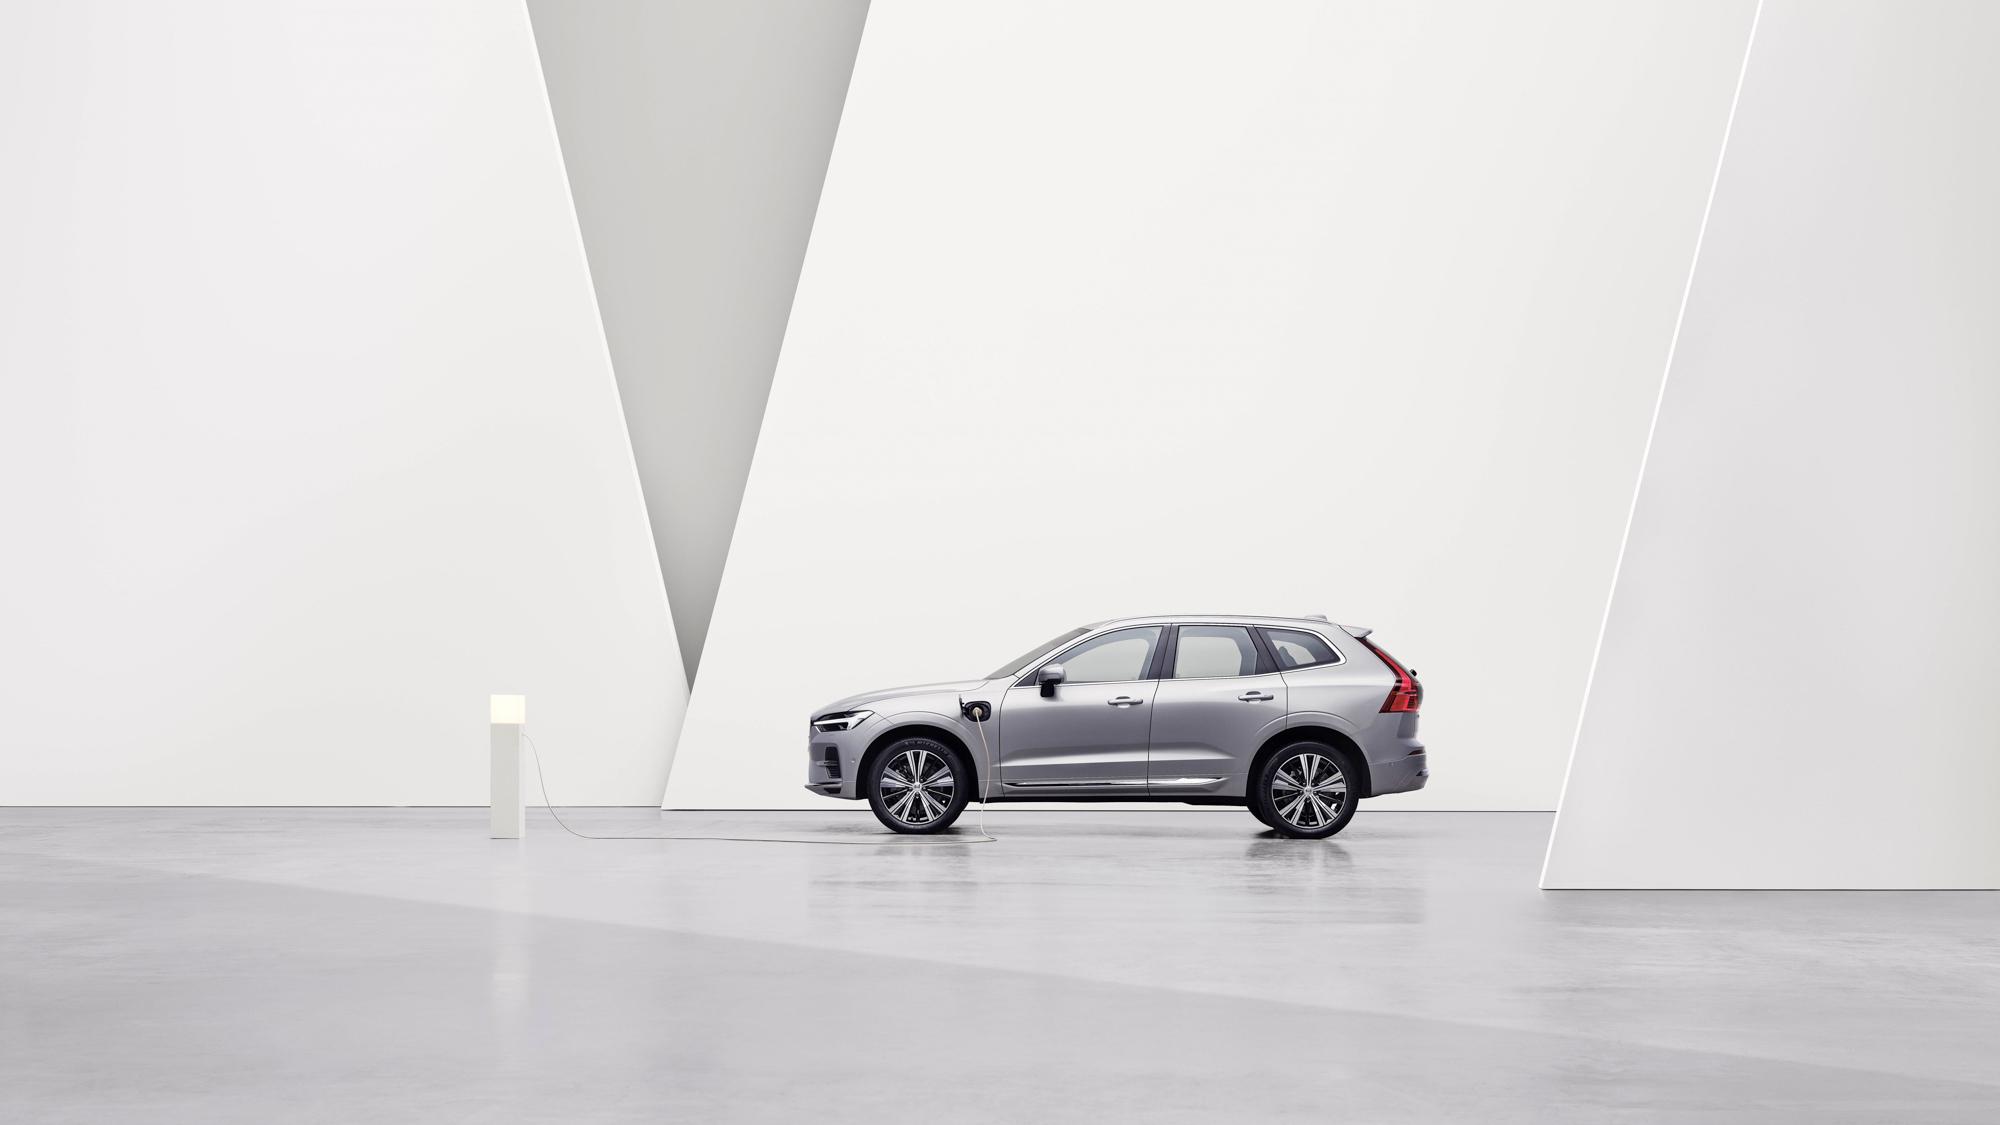 ▲ Volvo 全新年式 PHEV 車型開放接單!21 年式 PHEV 車款調降售價 3%